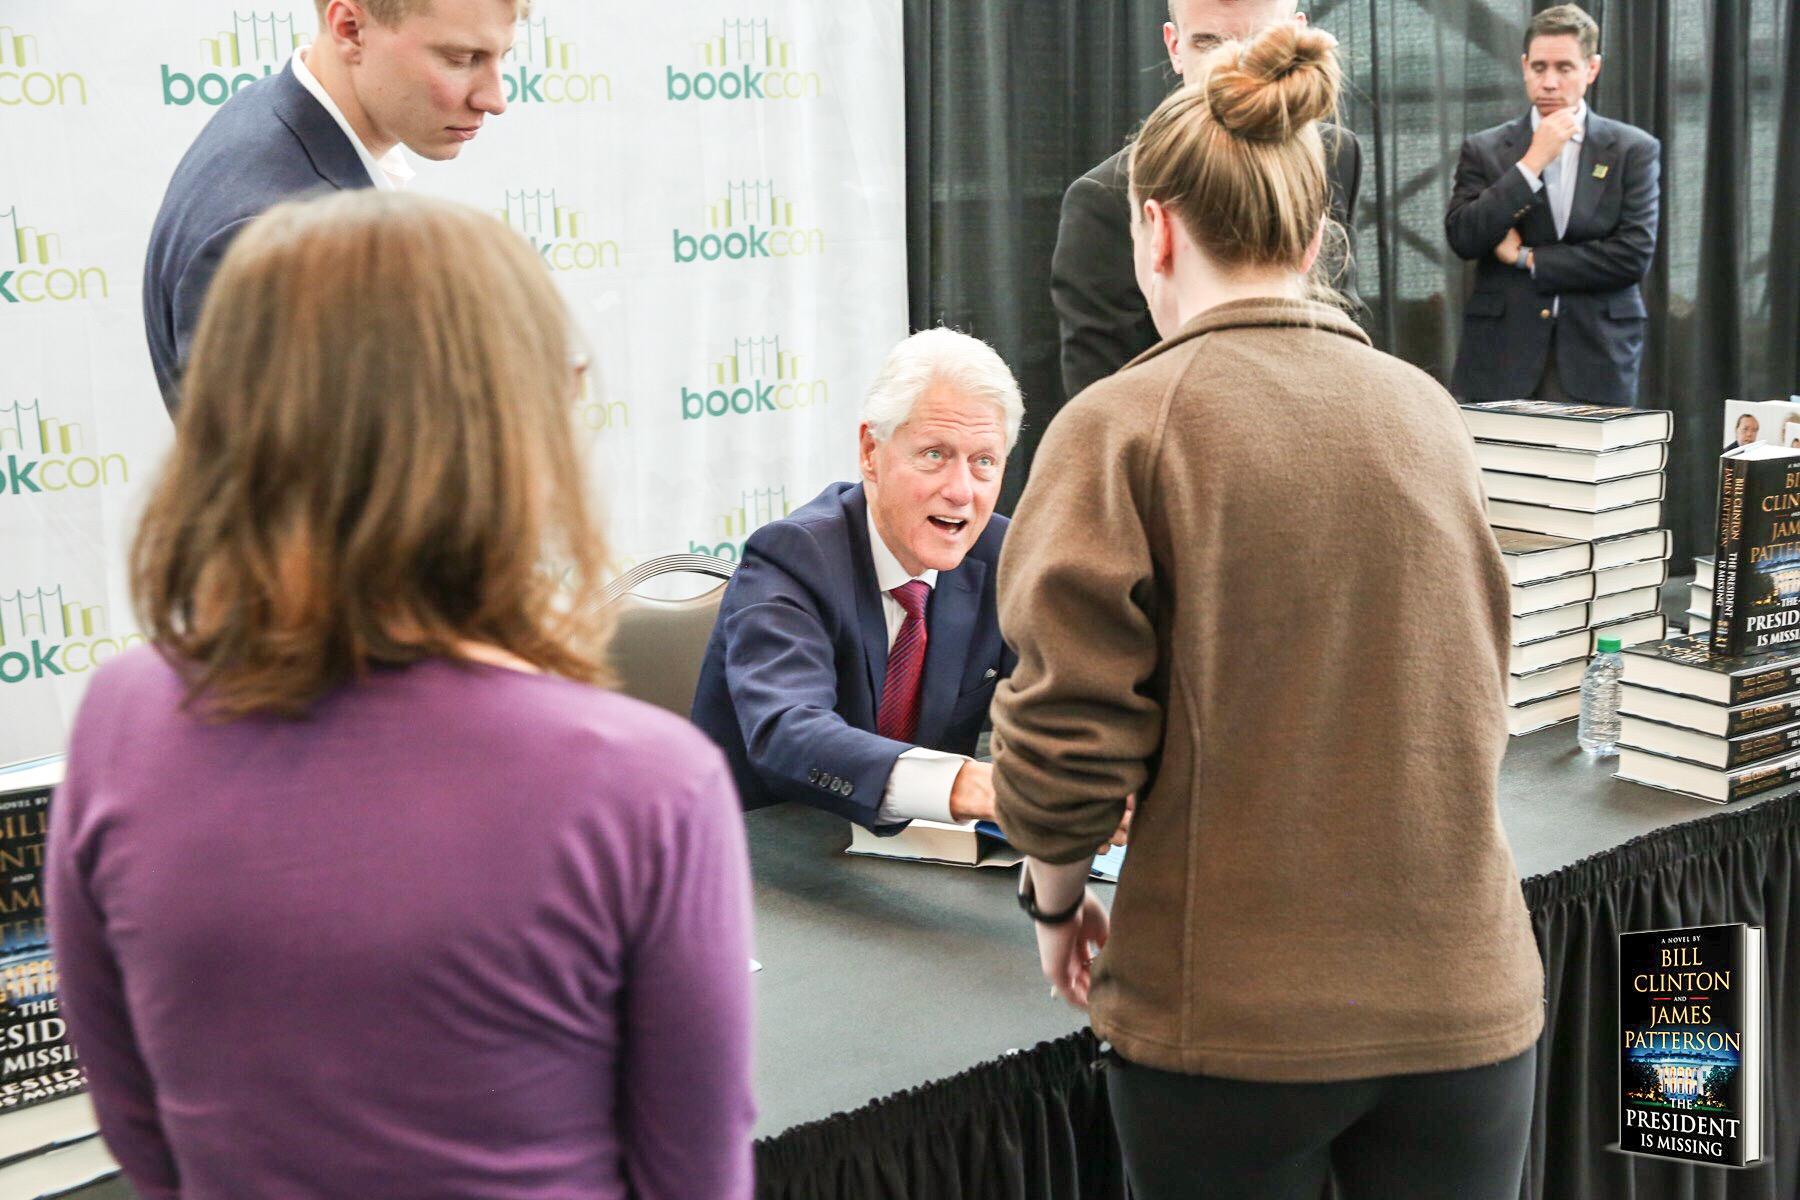 bookcon-2018-bill-clinton-handshake.jpg